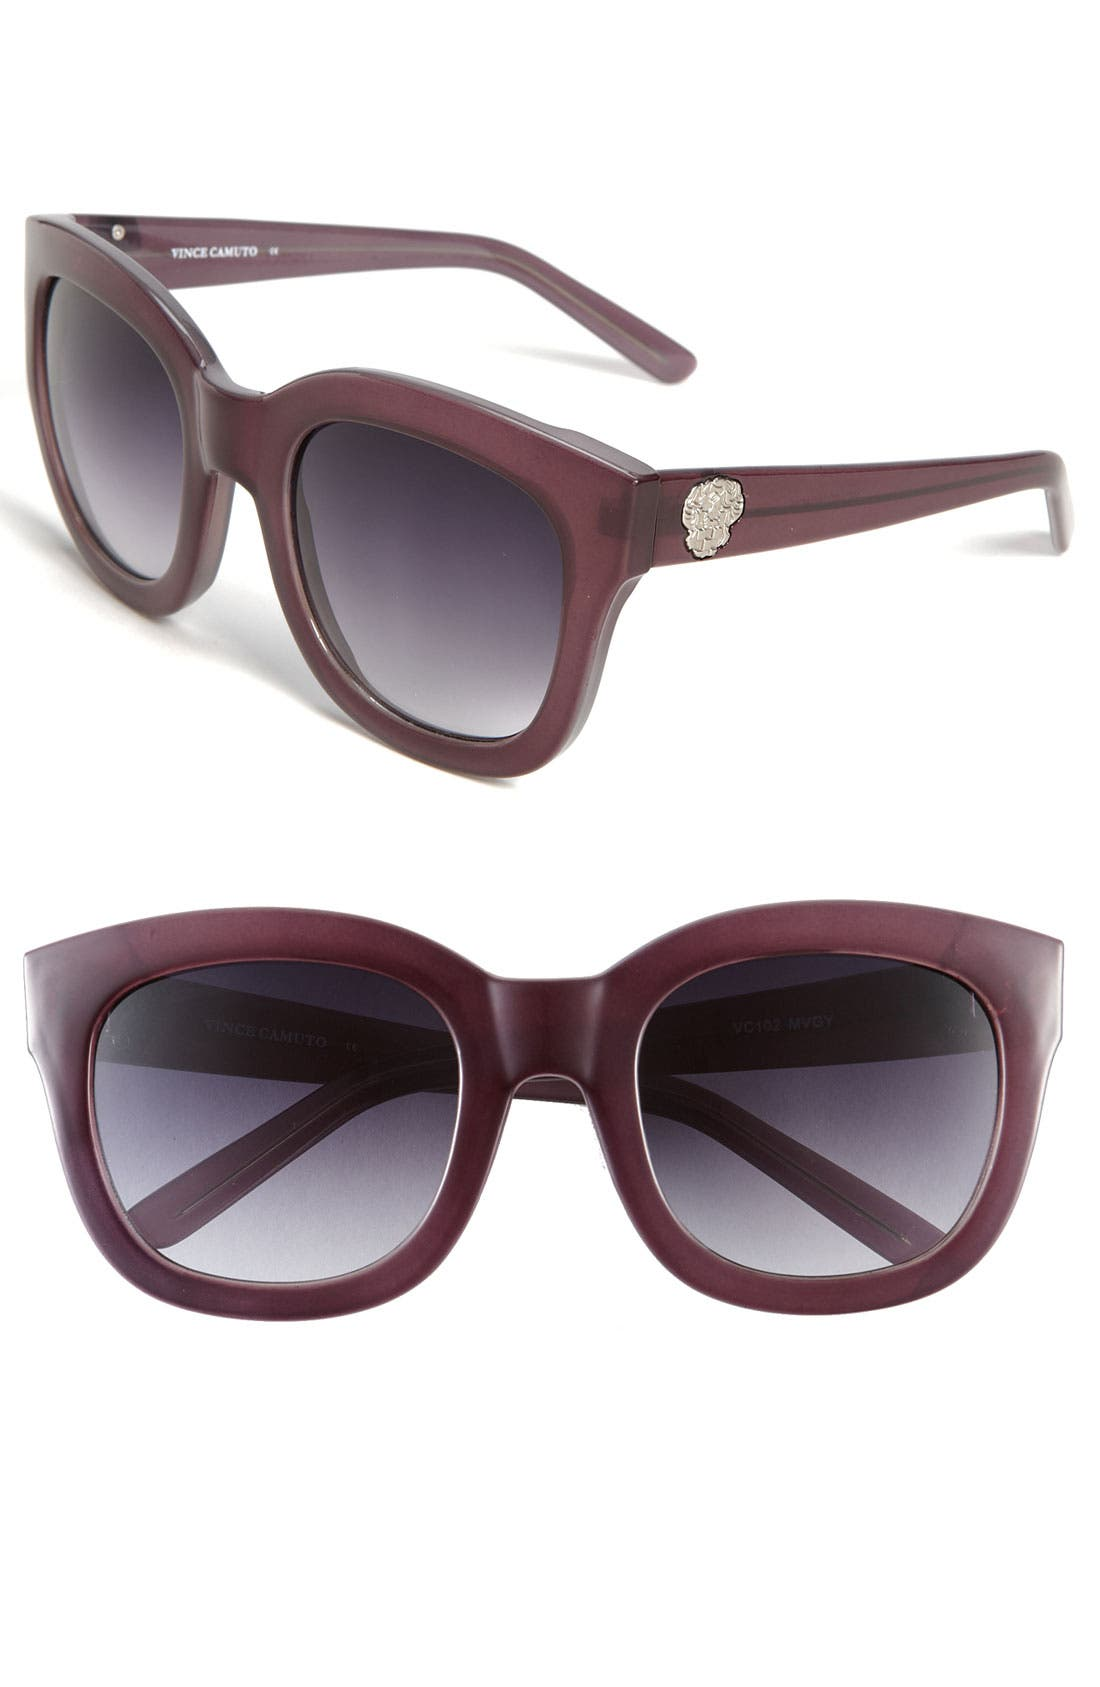 Alternate Image 1 Selected - Vince Camuto 54mm Oversized Cat Eye Sunglasses